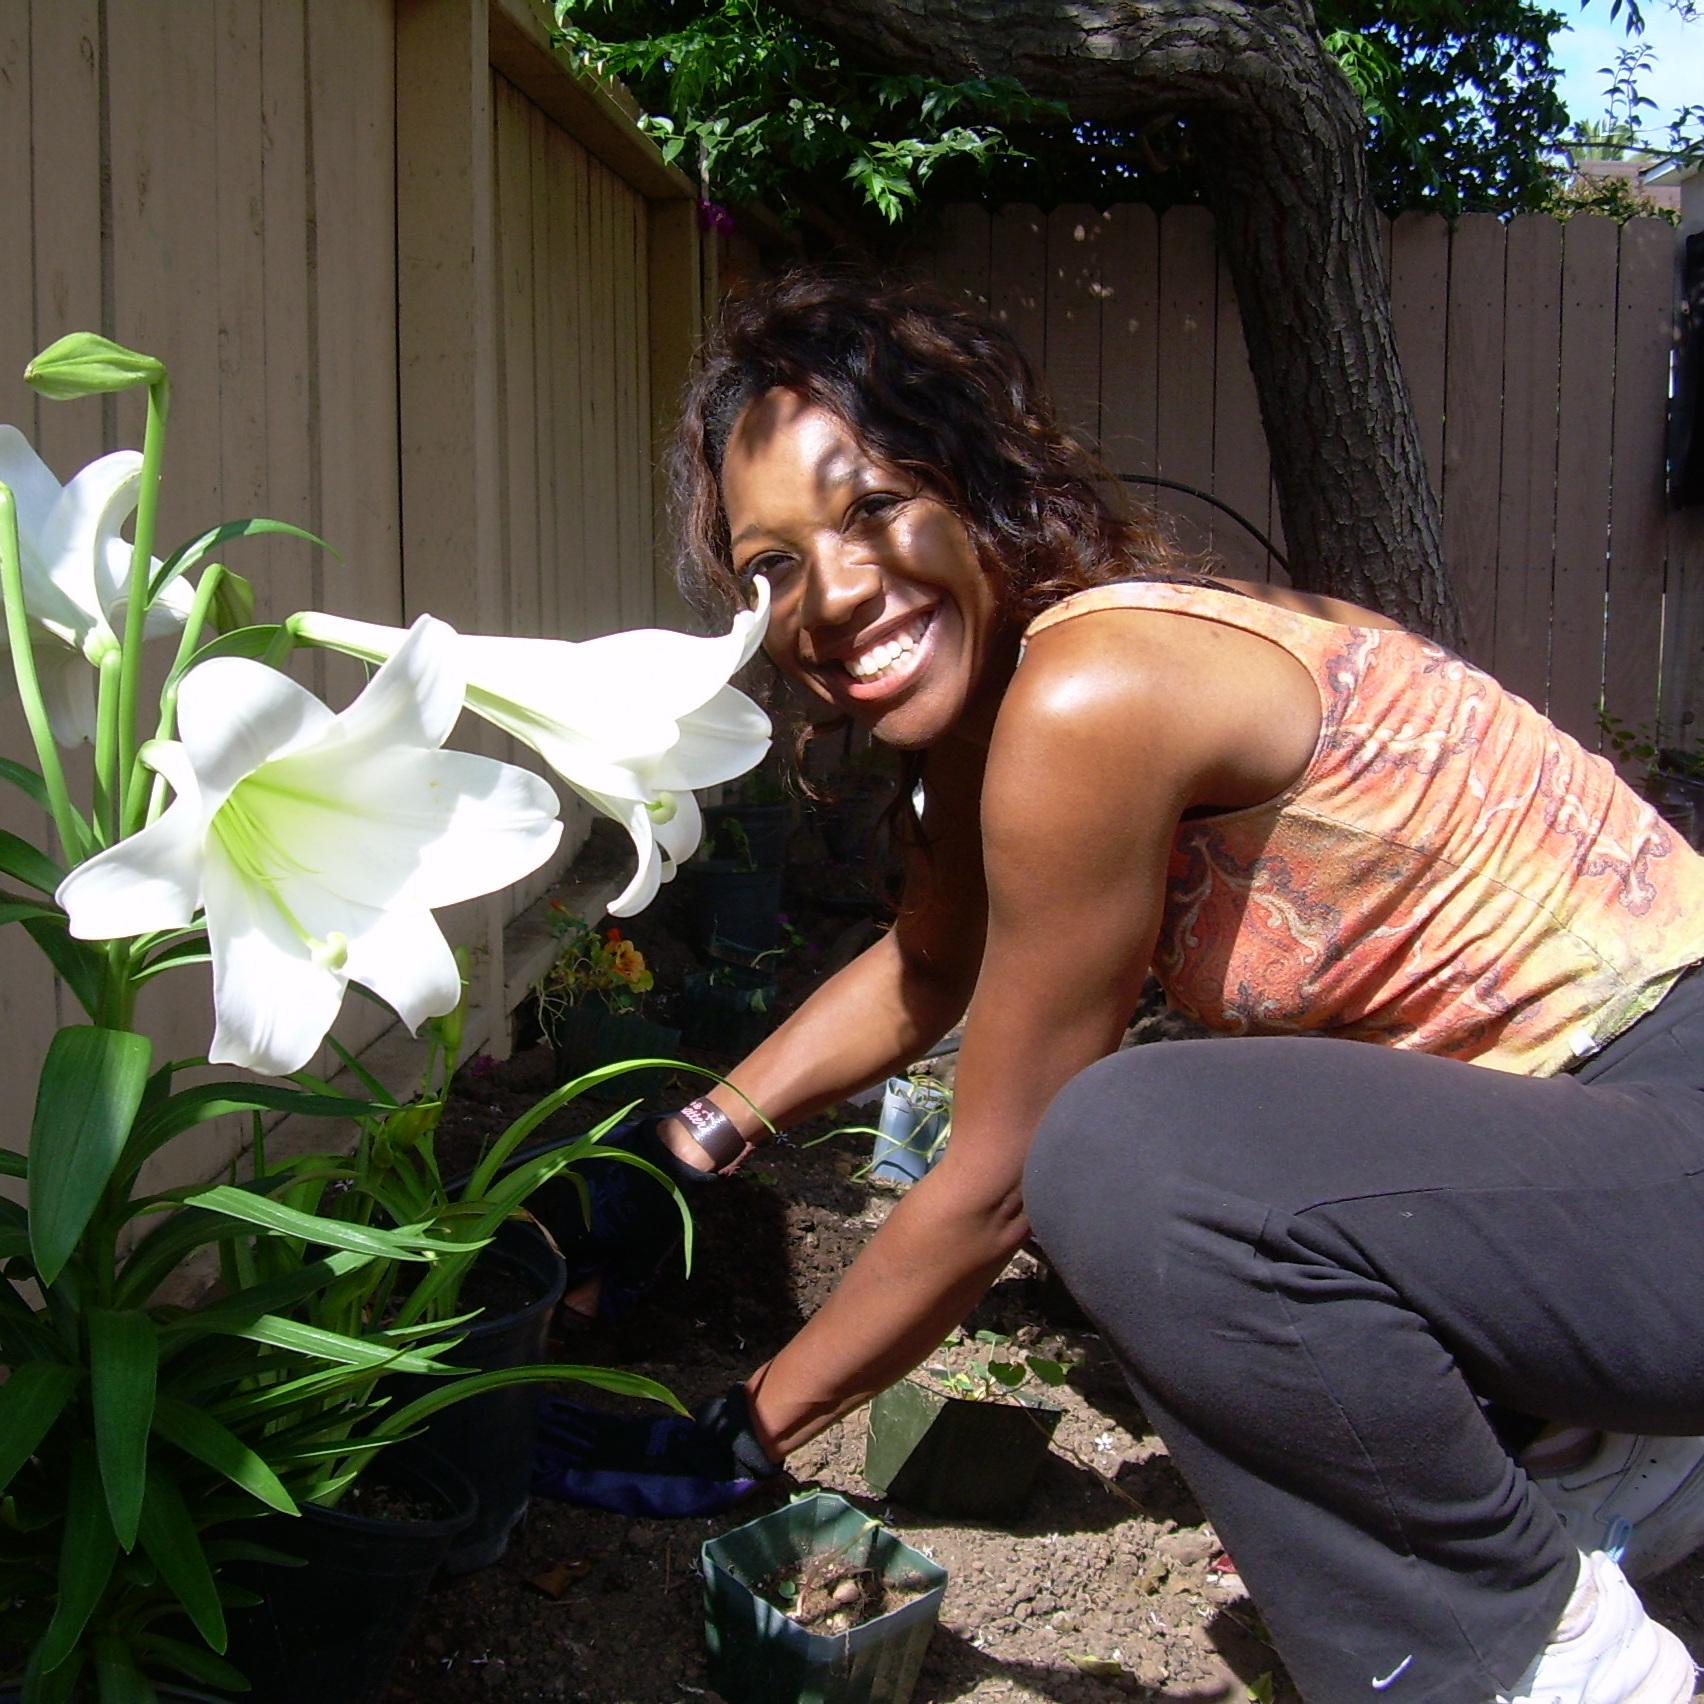 Tia+planting+lilies.jpg